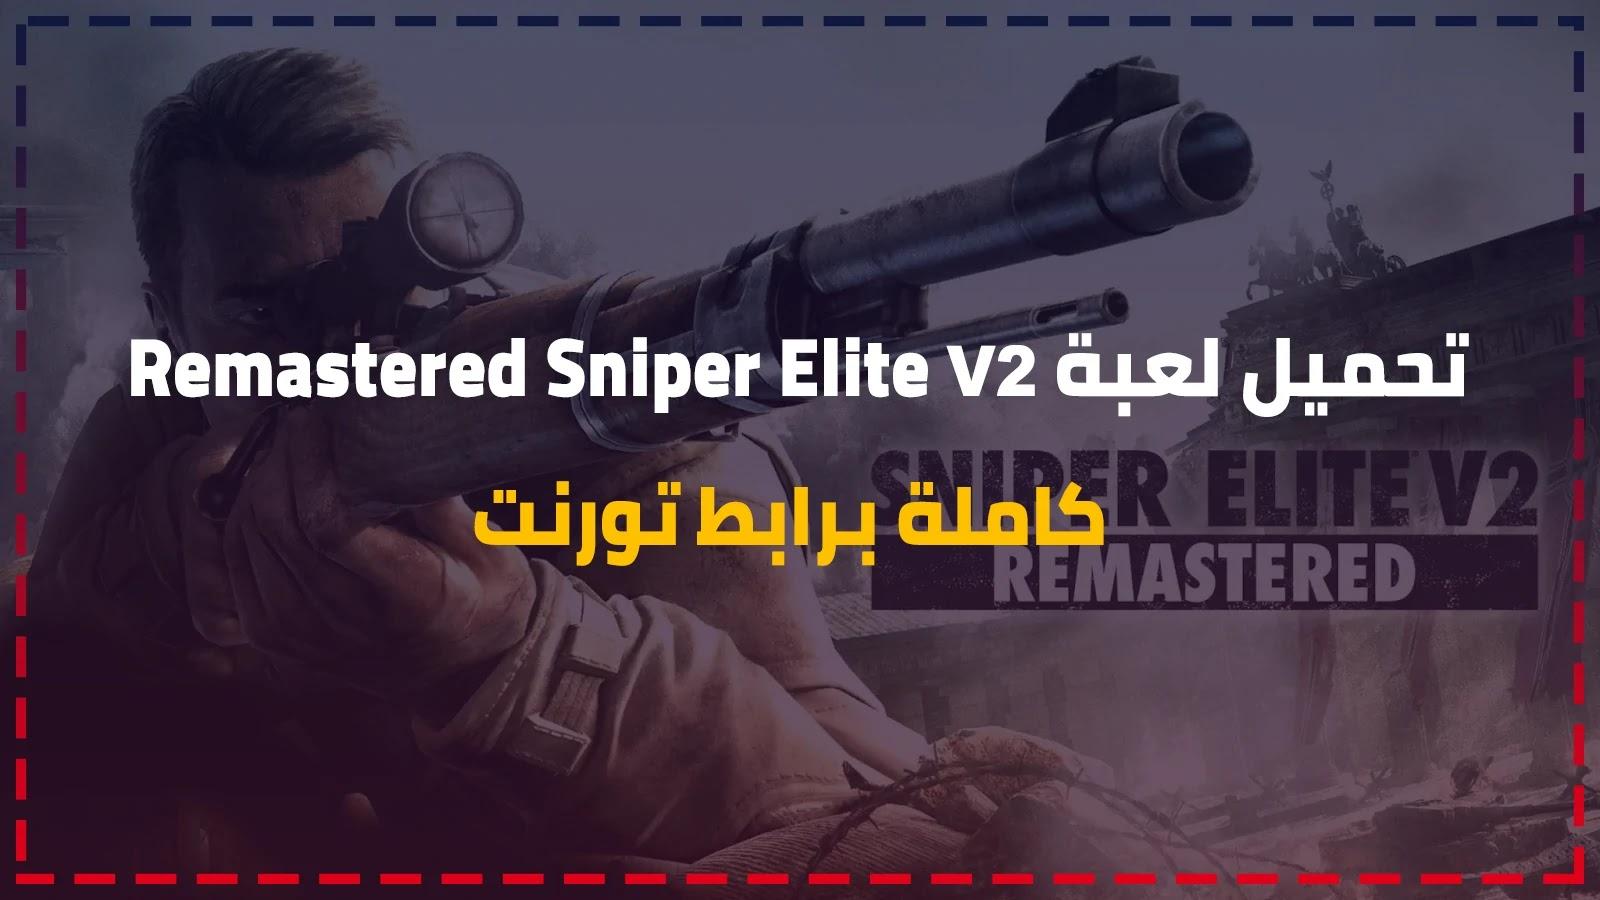 تحميل لعبة Sniper Elite V2 Remastered